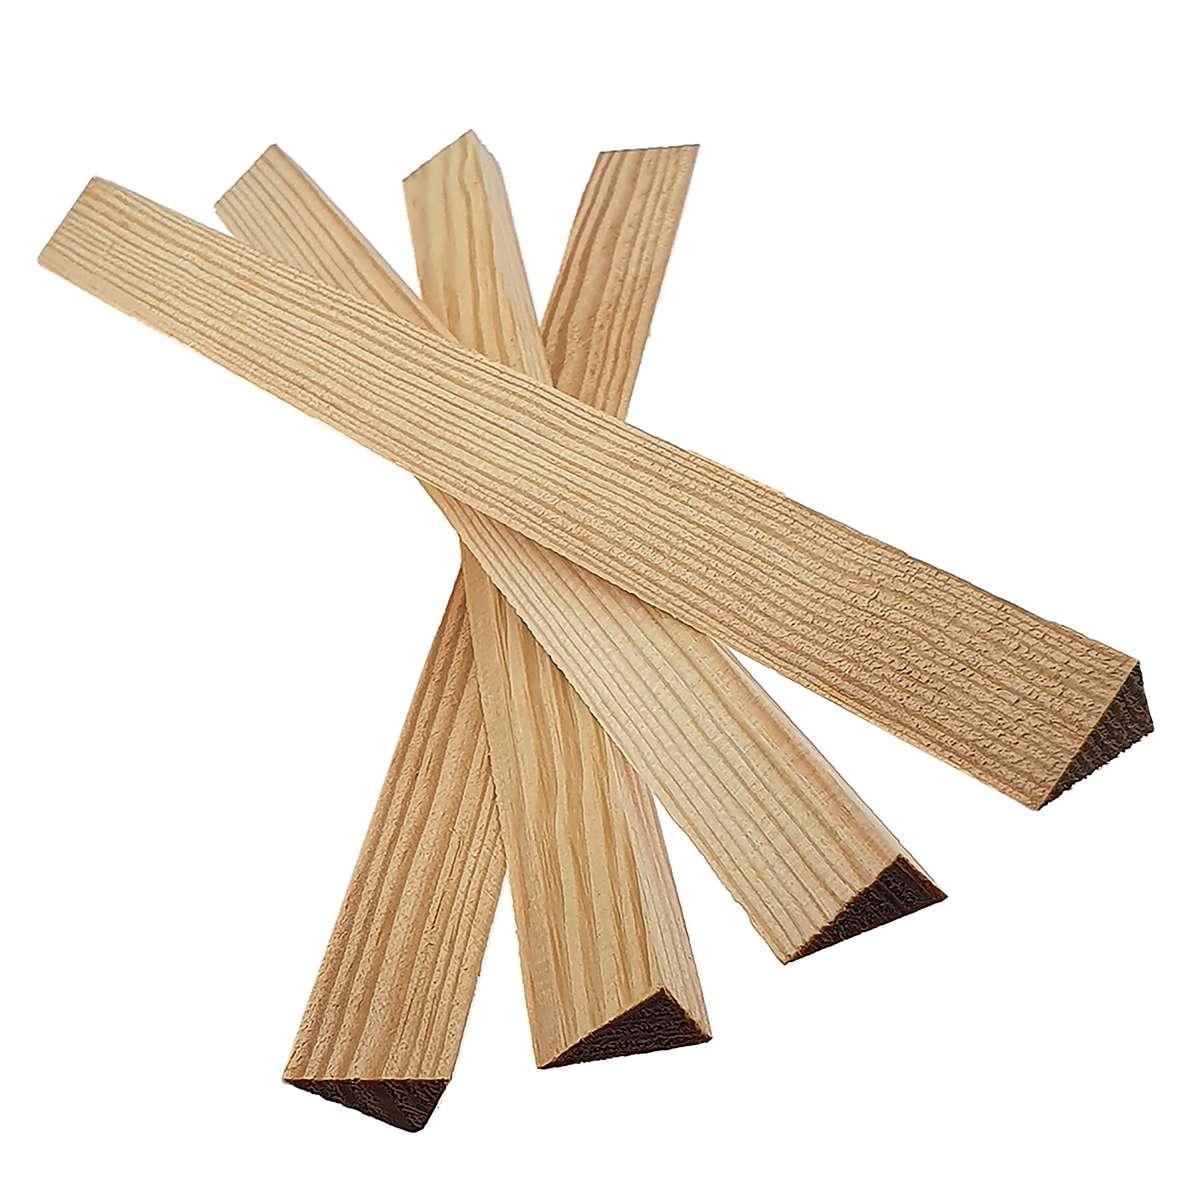 Triangular slats for #90050